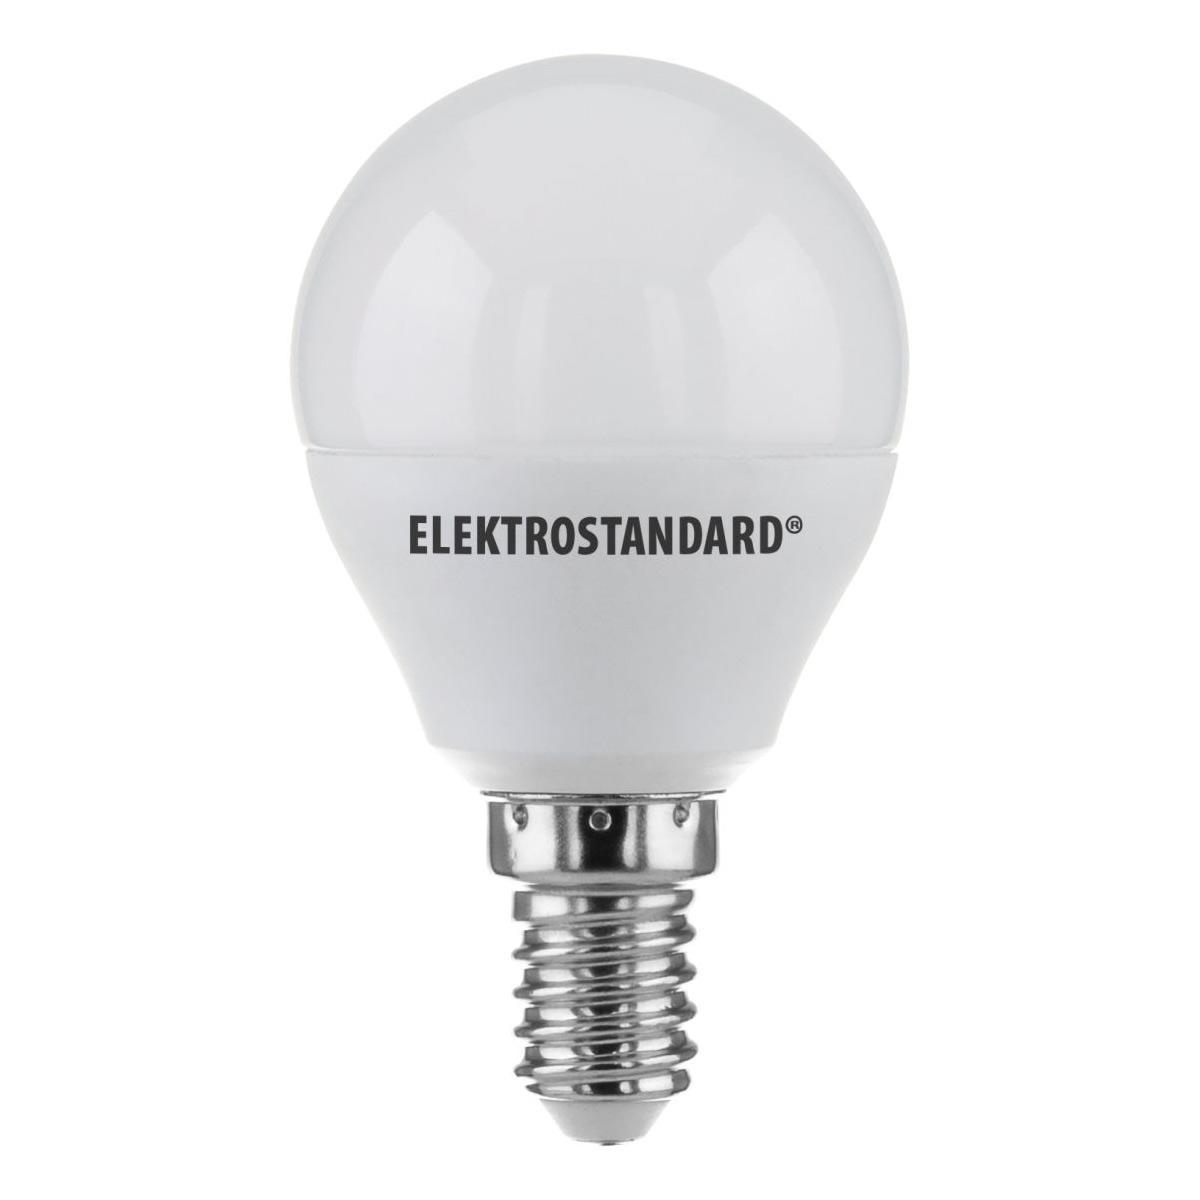 Лампа светодиодная E14 7W 4200K матовая 4690389085390 лампа светодиодная gu5 3 7w 4200k матовая 4690389081668